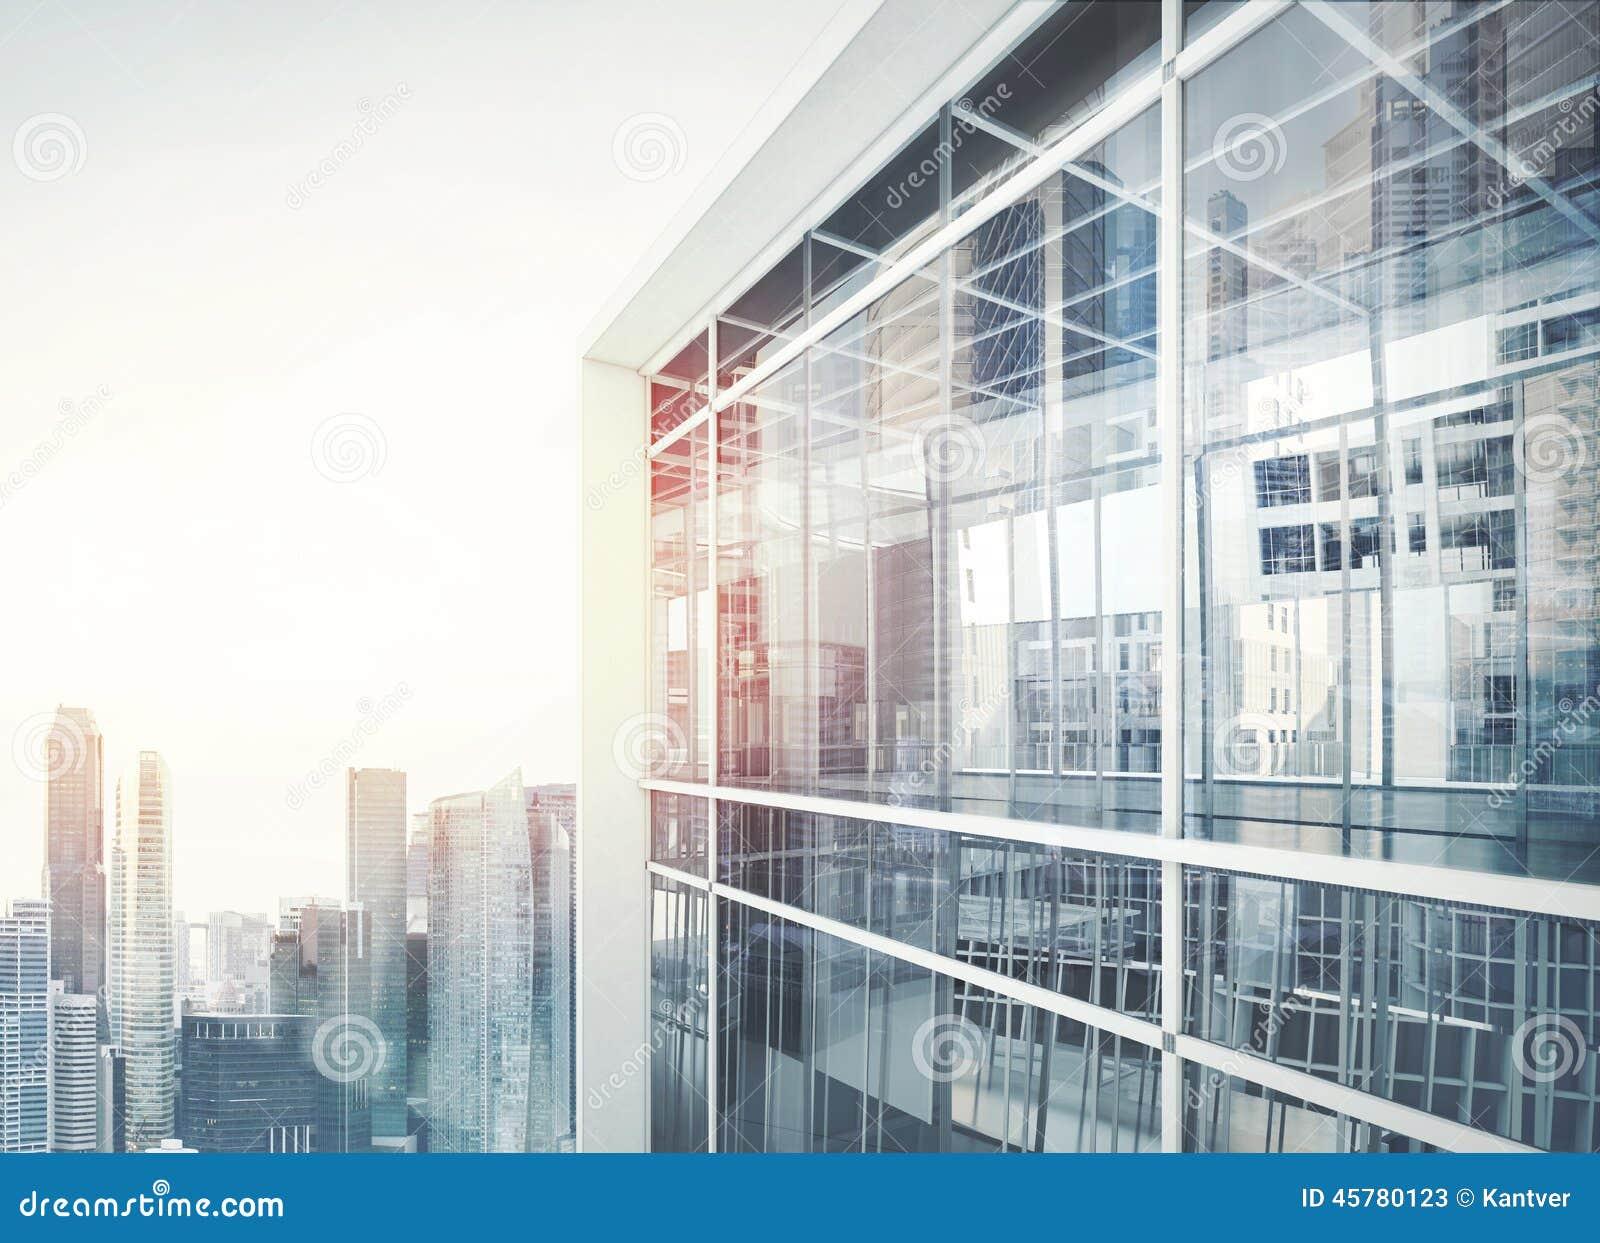 Fachada moderna del edificio de oficinas imagen de archivo for Fachadas modernas para oficinas